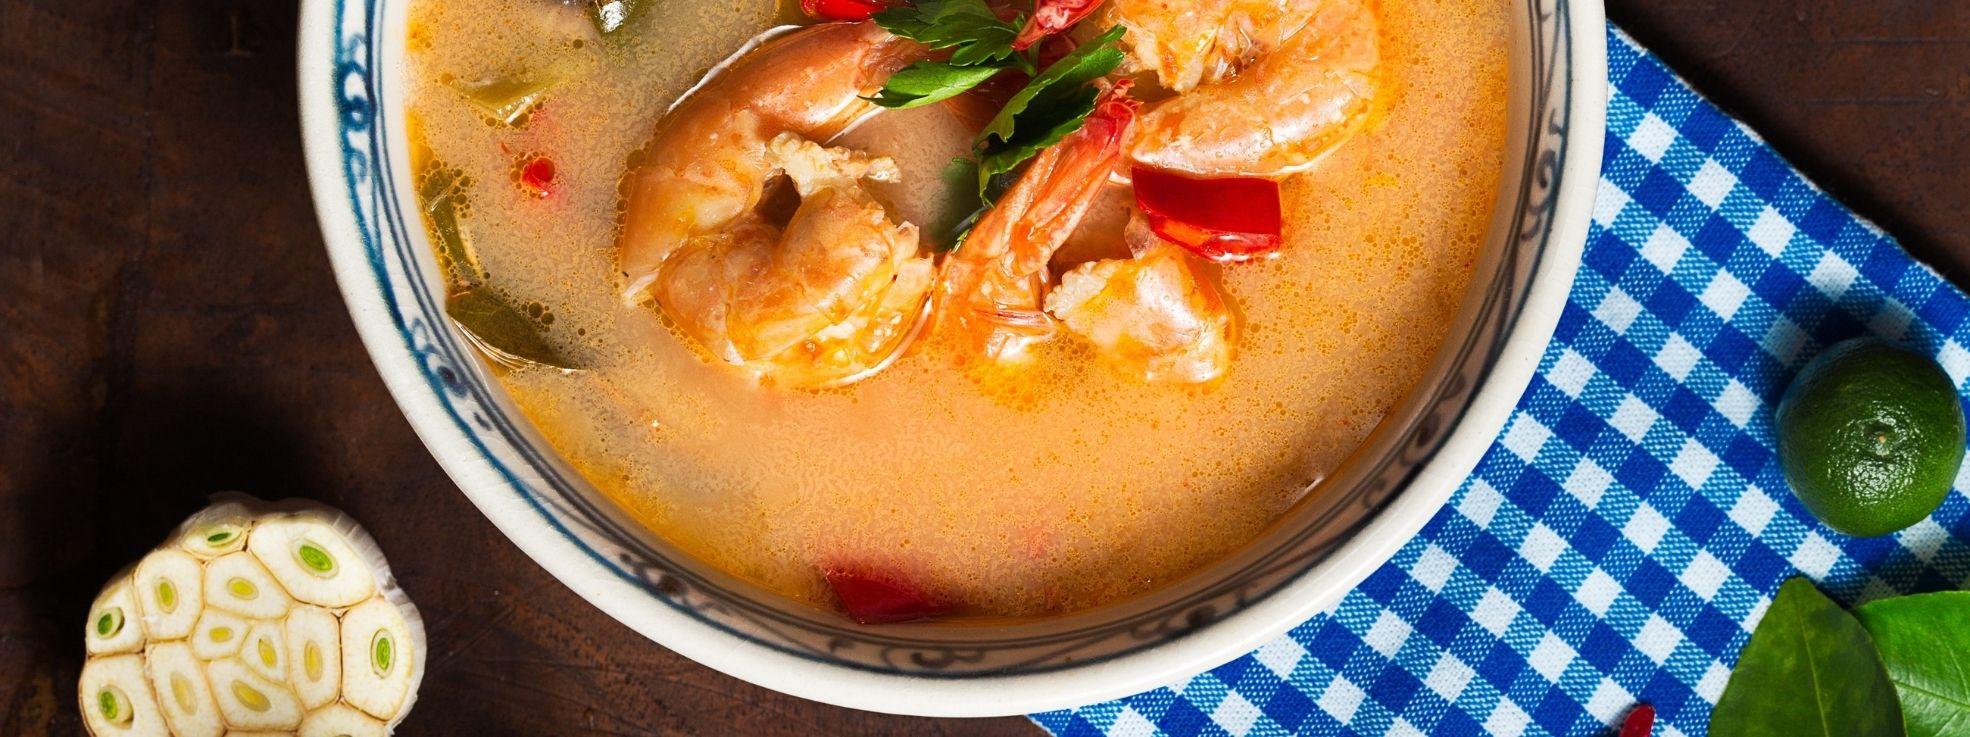 Best Pan Asian Restaurants in Karachi